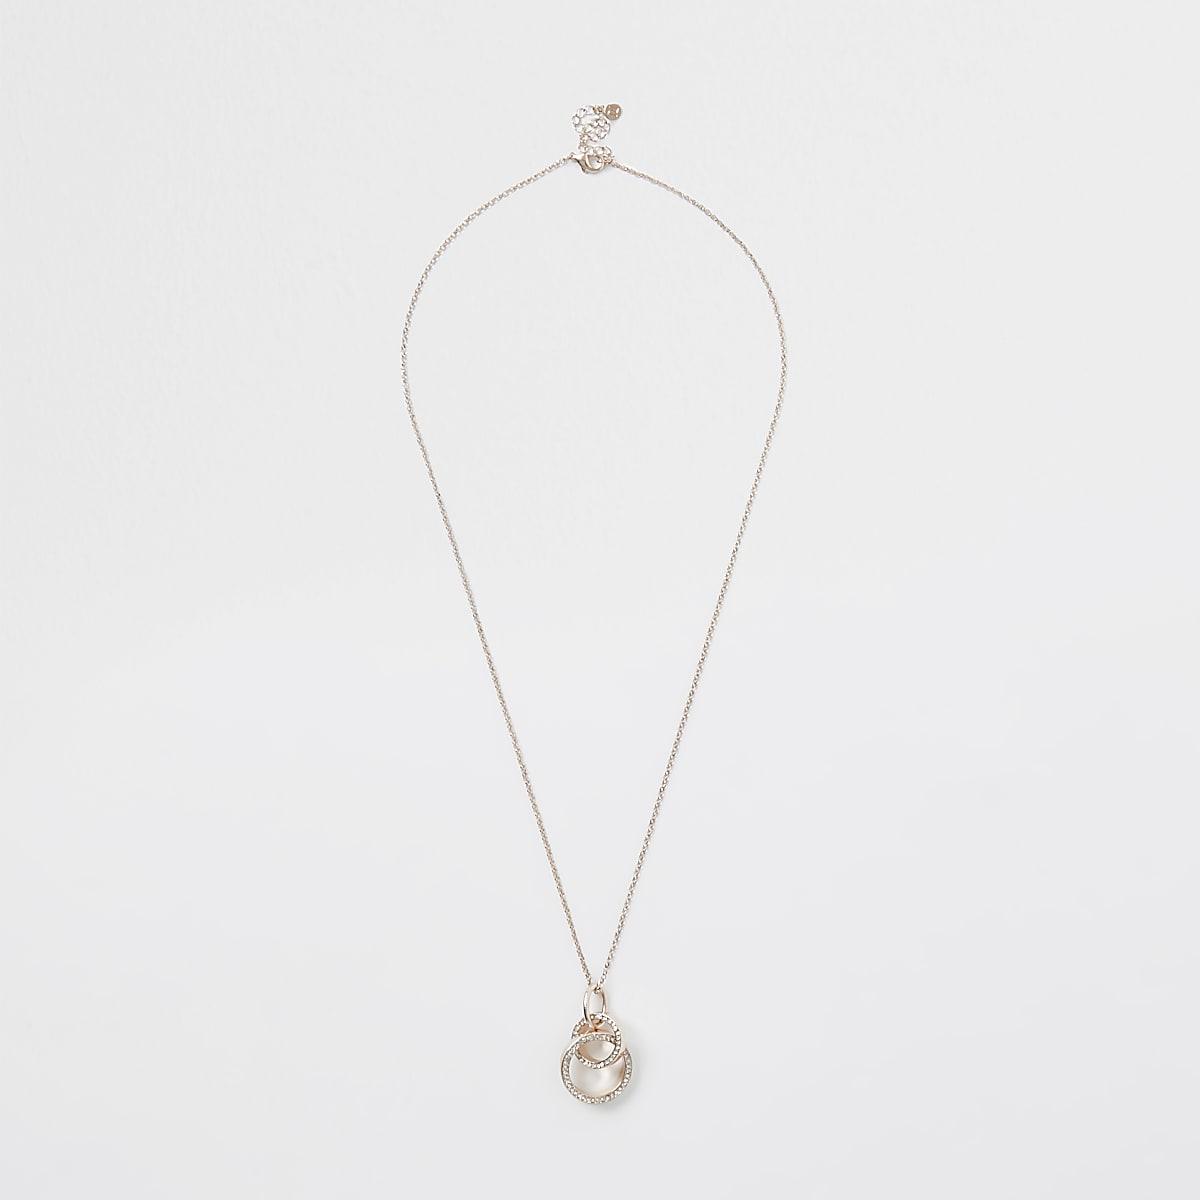 Rose gold paved interlinked pendant necklace